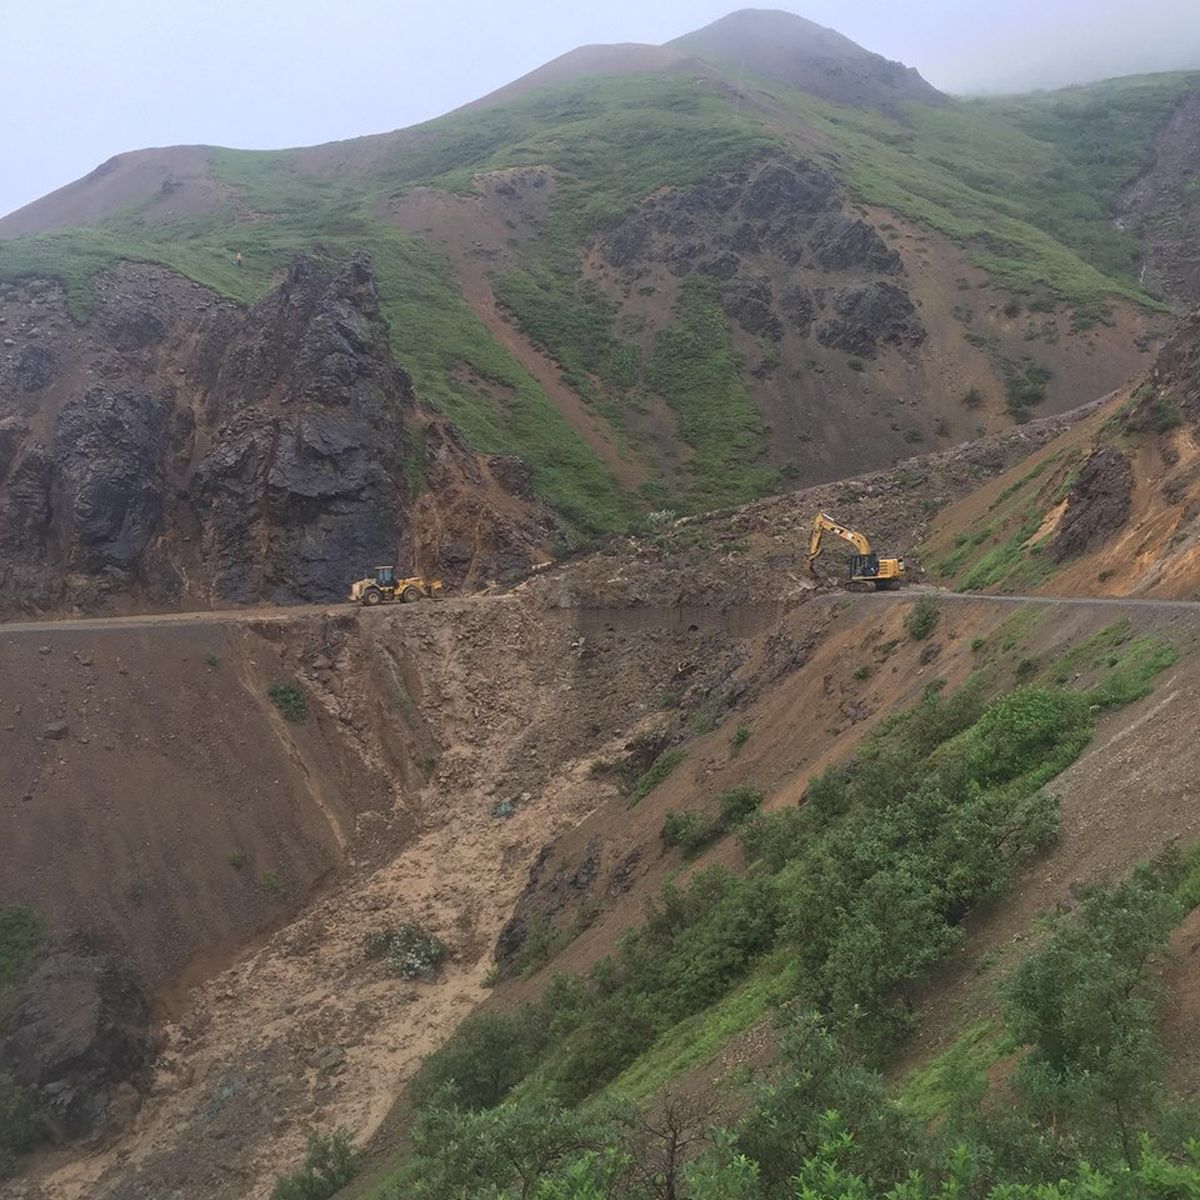 A mudslide closed the Denali Park Road at Mile 67 on Saturday, July 30, 2016. (James Long / NPS photo)